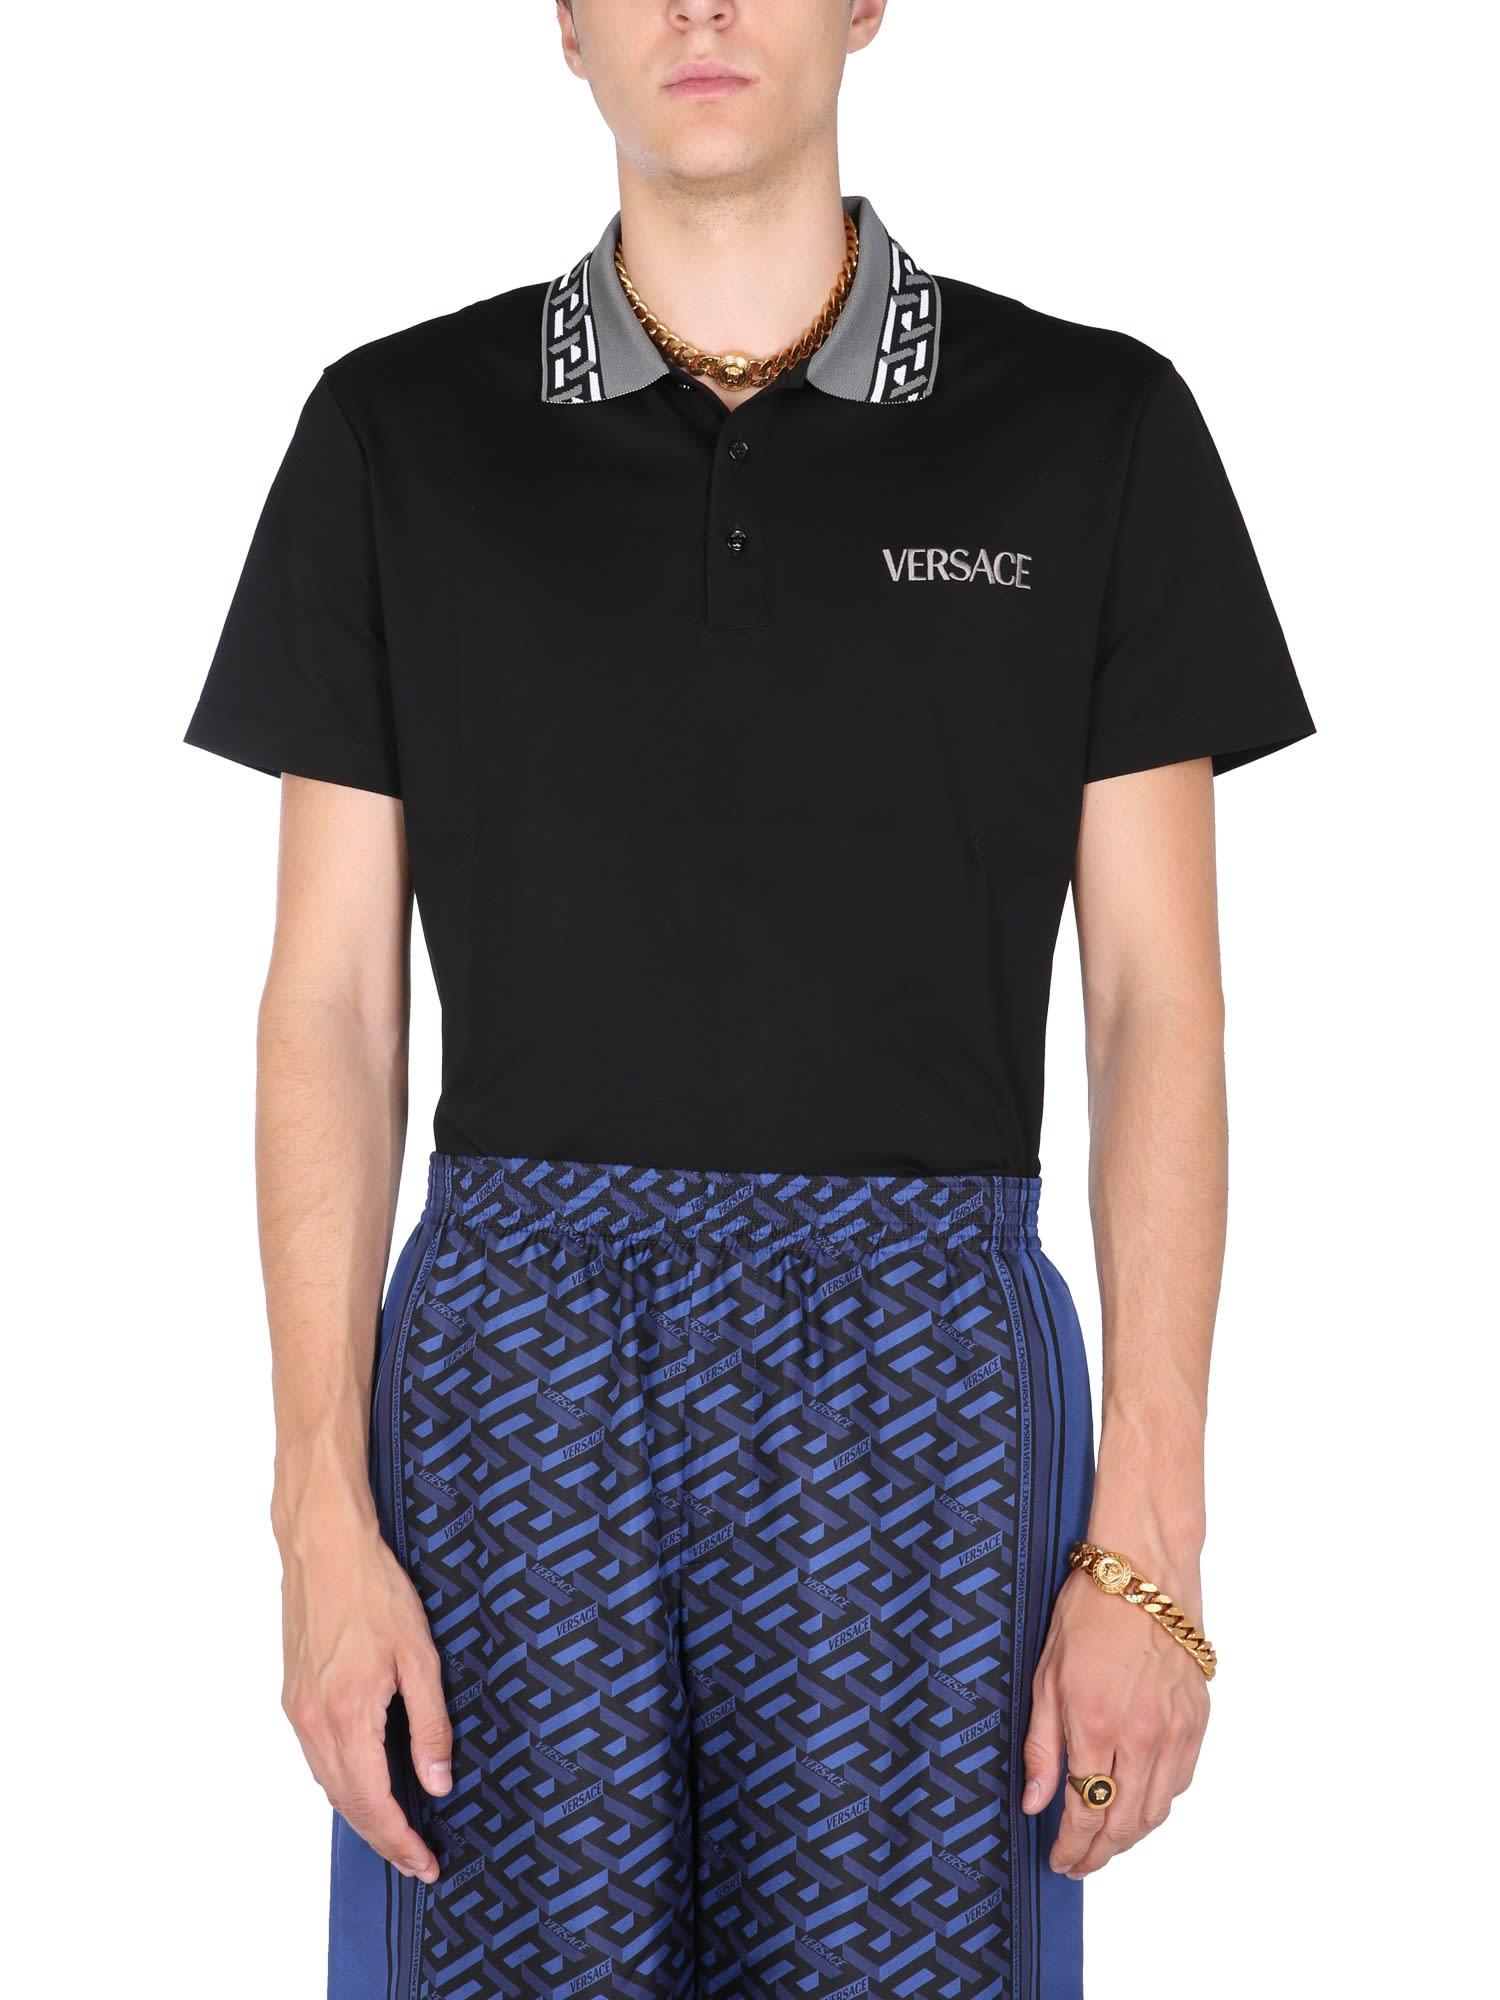 Versace Polo Shirt With Greek Print